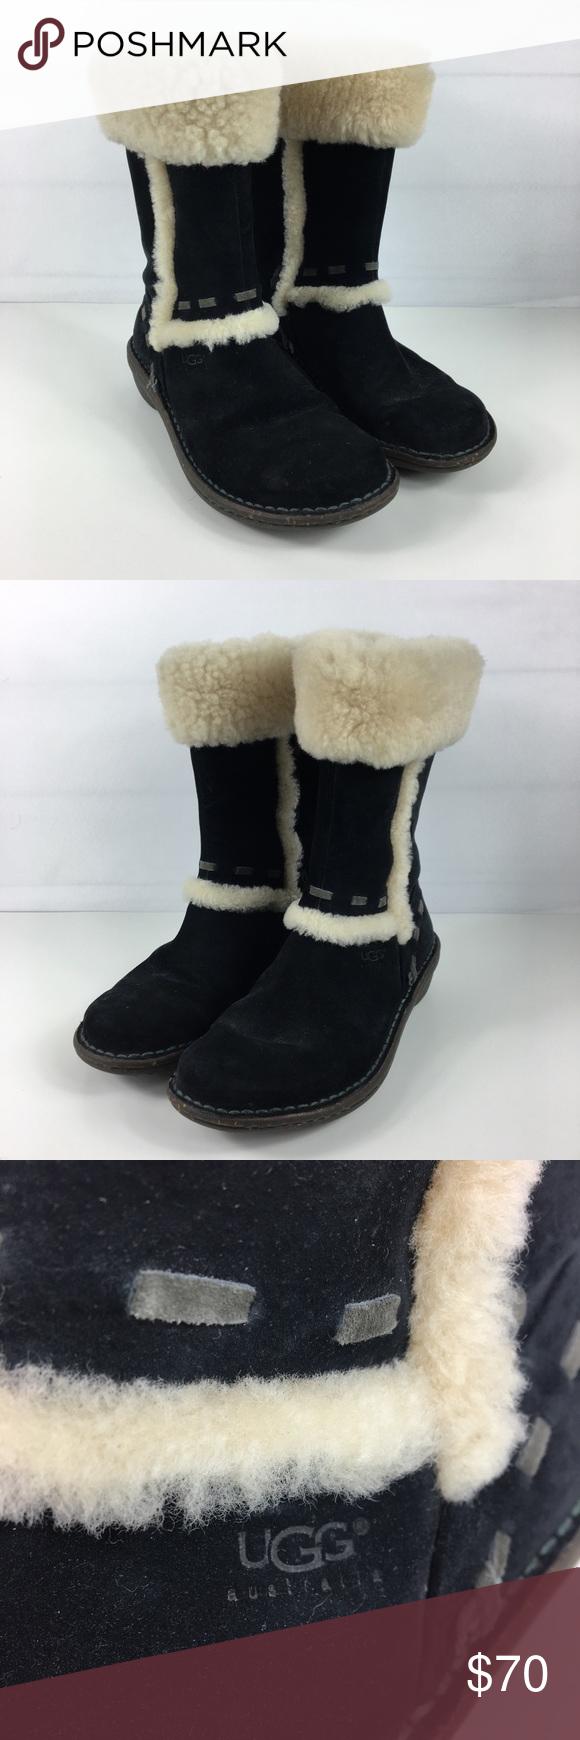 Women's Elijo UGG Boots